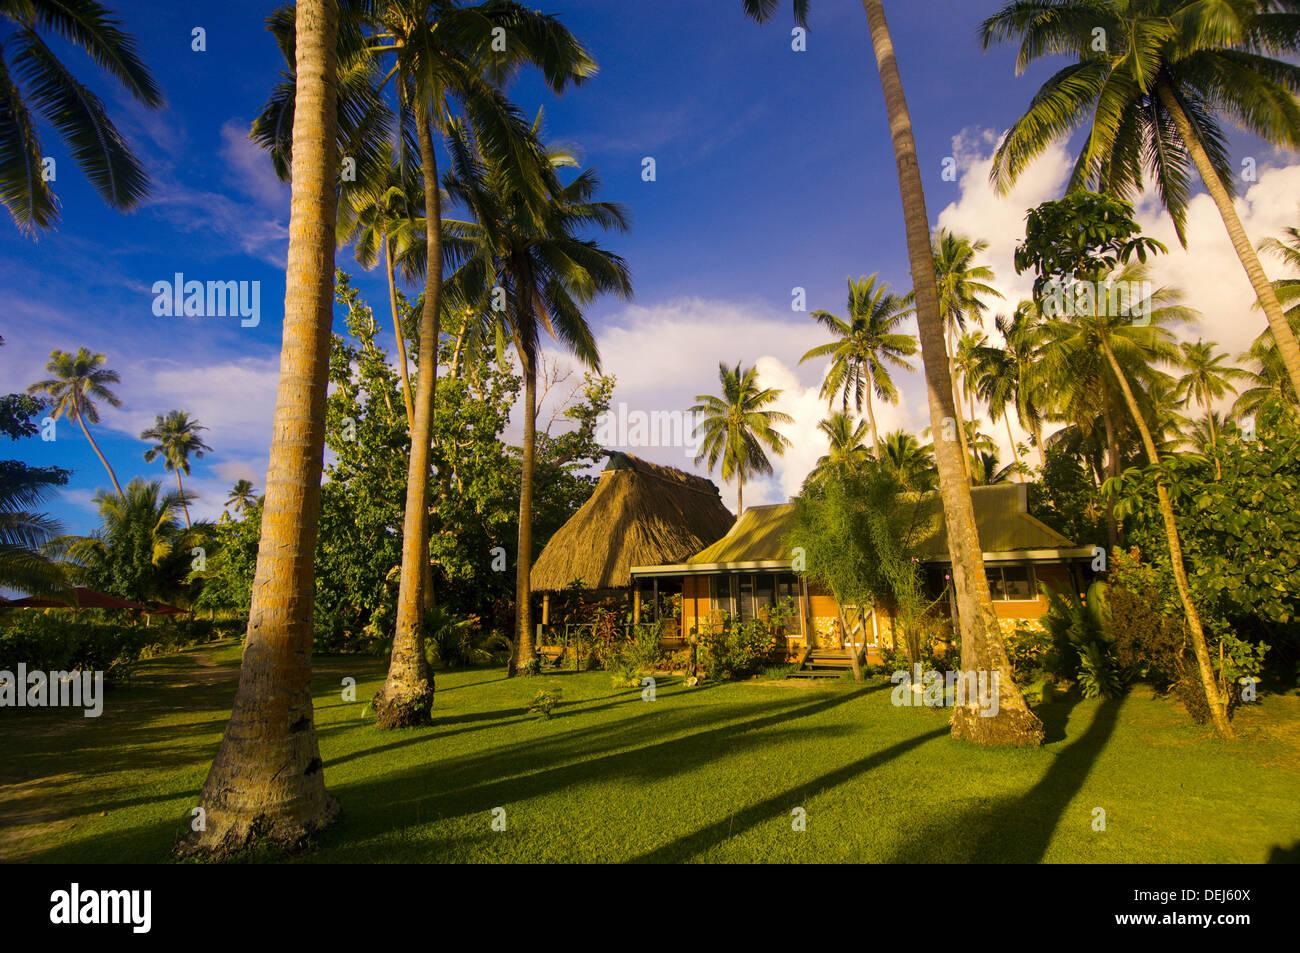 Beach Bure Nukubati Island Resort Fiji Islands Stock Photo